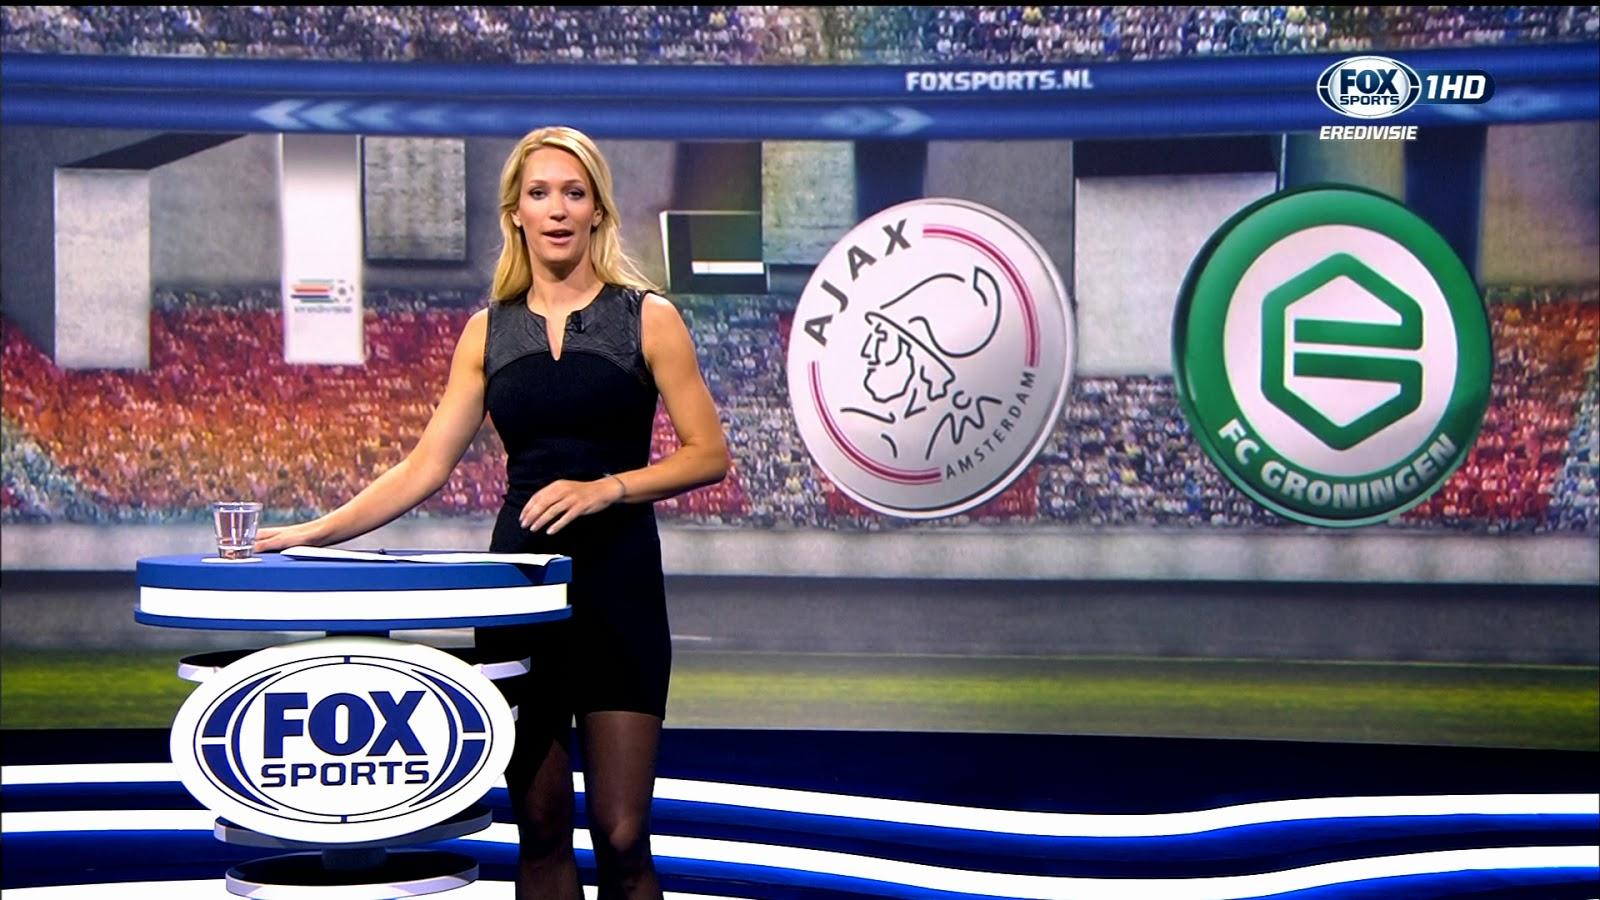 league fox sport: